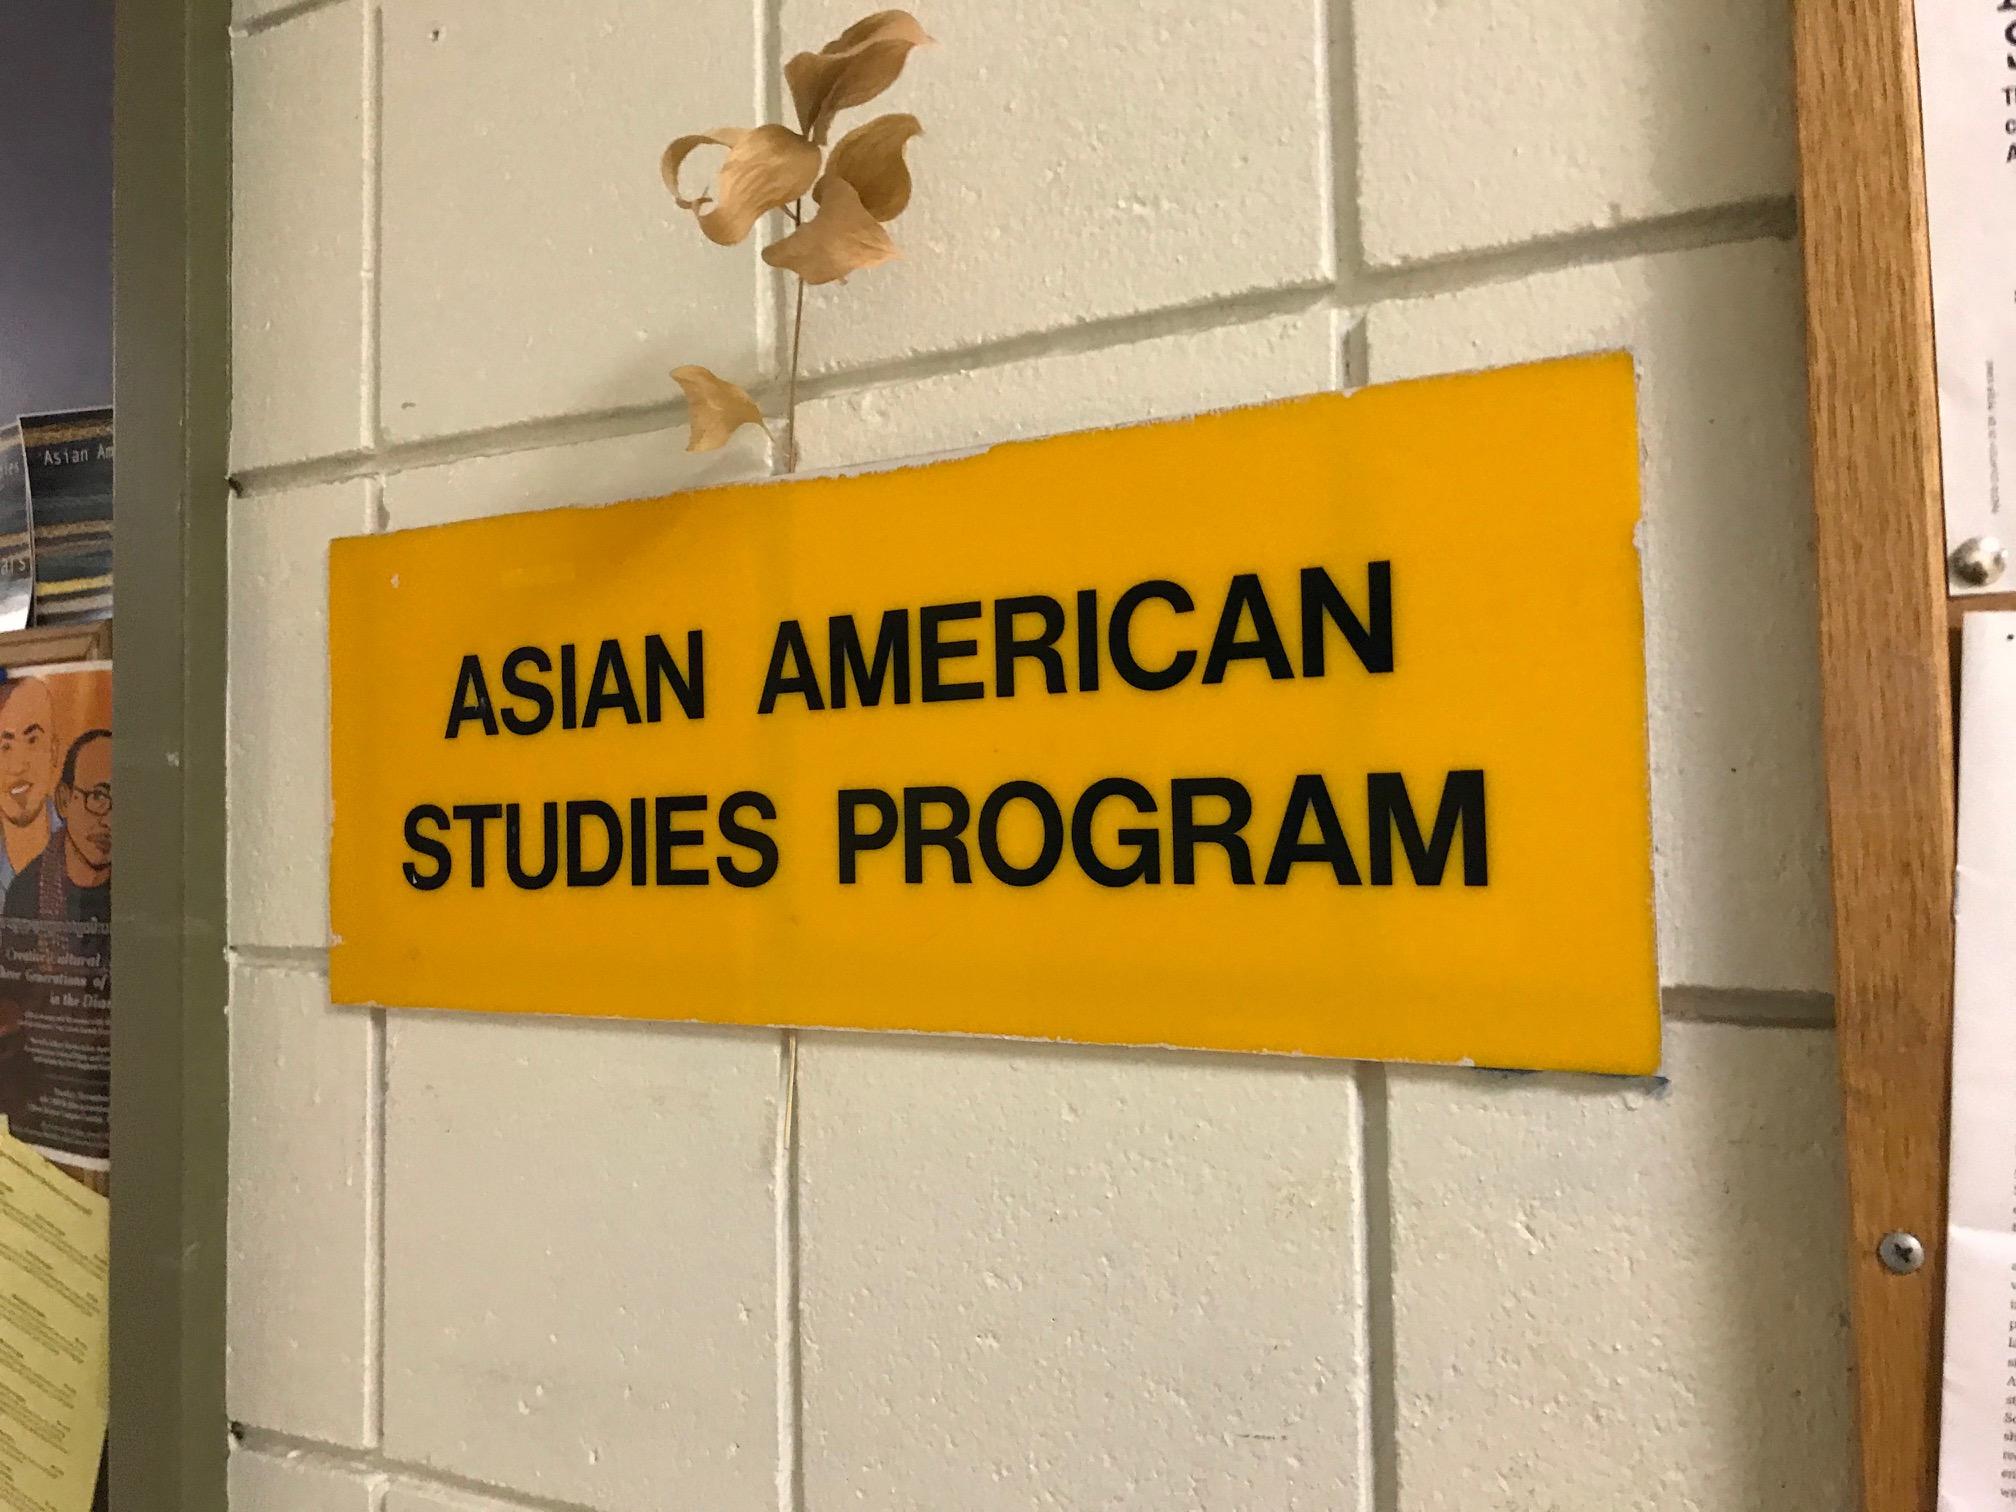 Meeting Asian American Studies at UMass Boston